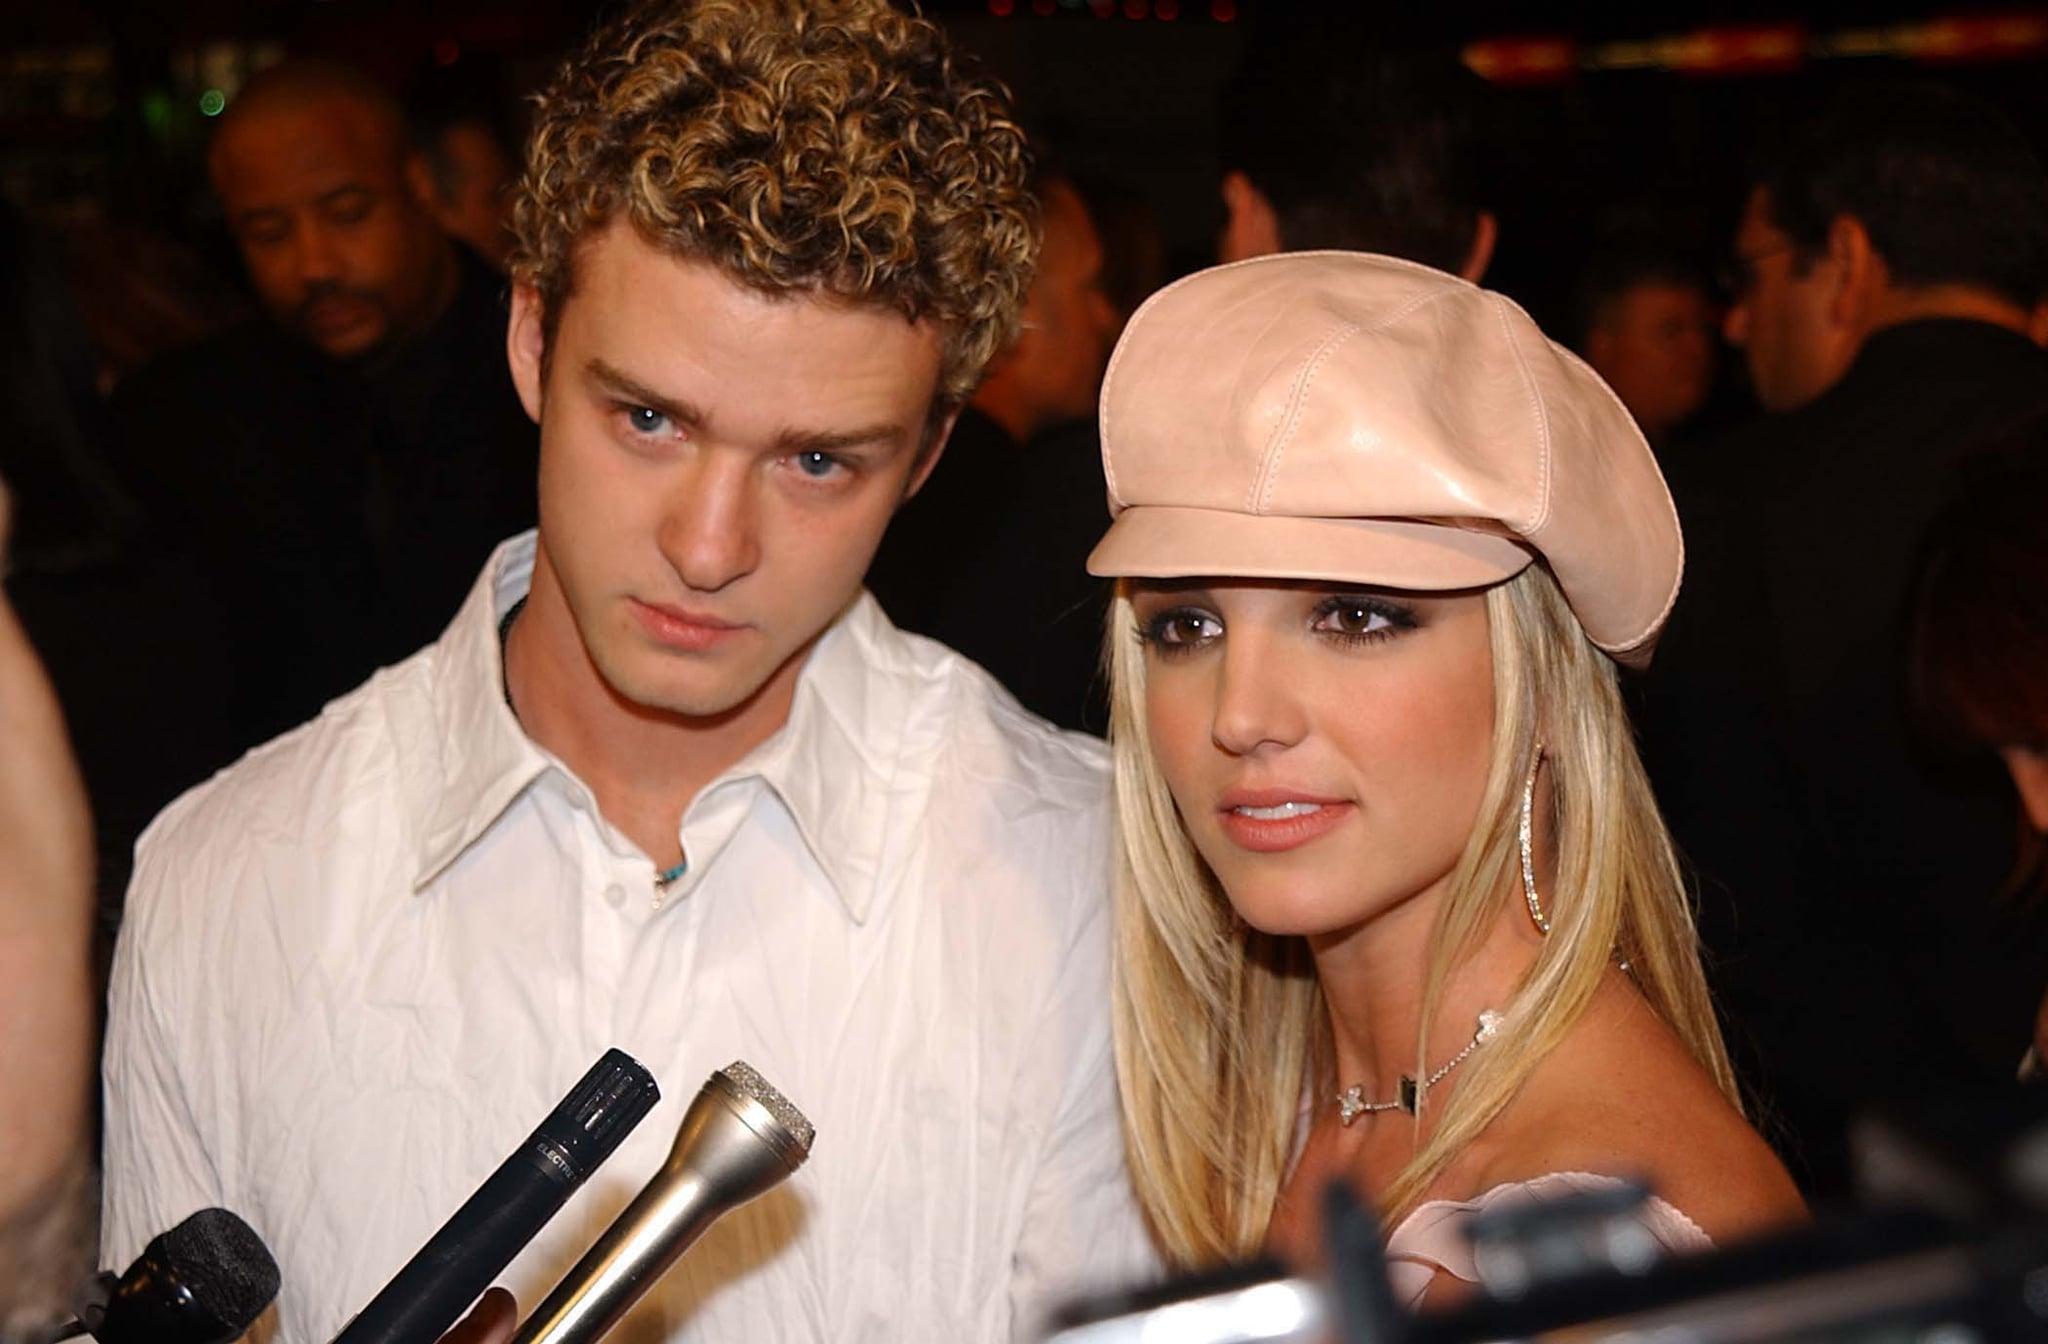 Justin Timberlake & Britney Spears (Photo by Jeff Kravitz/FilmMagic)